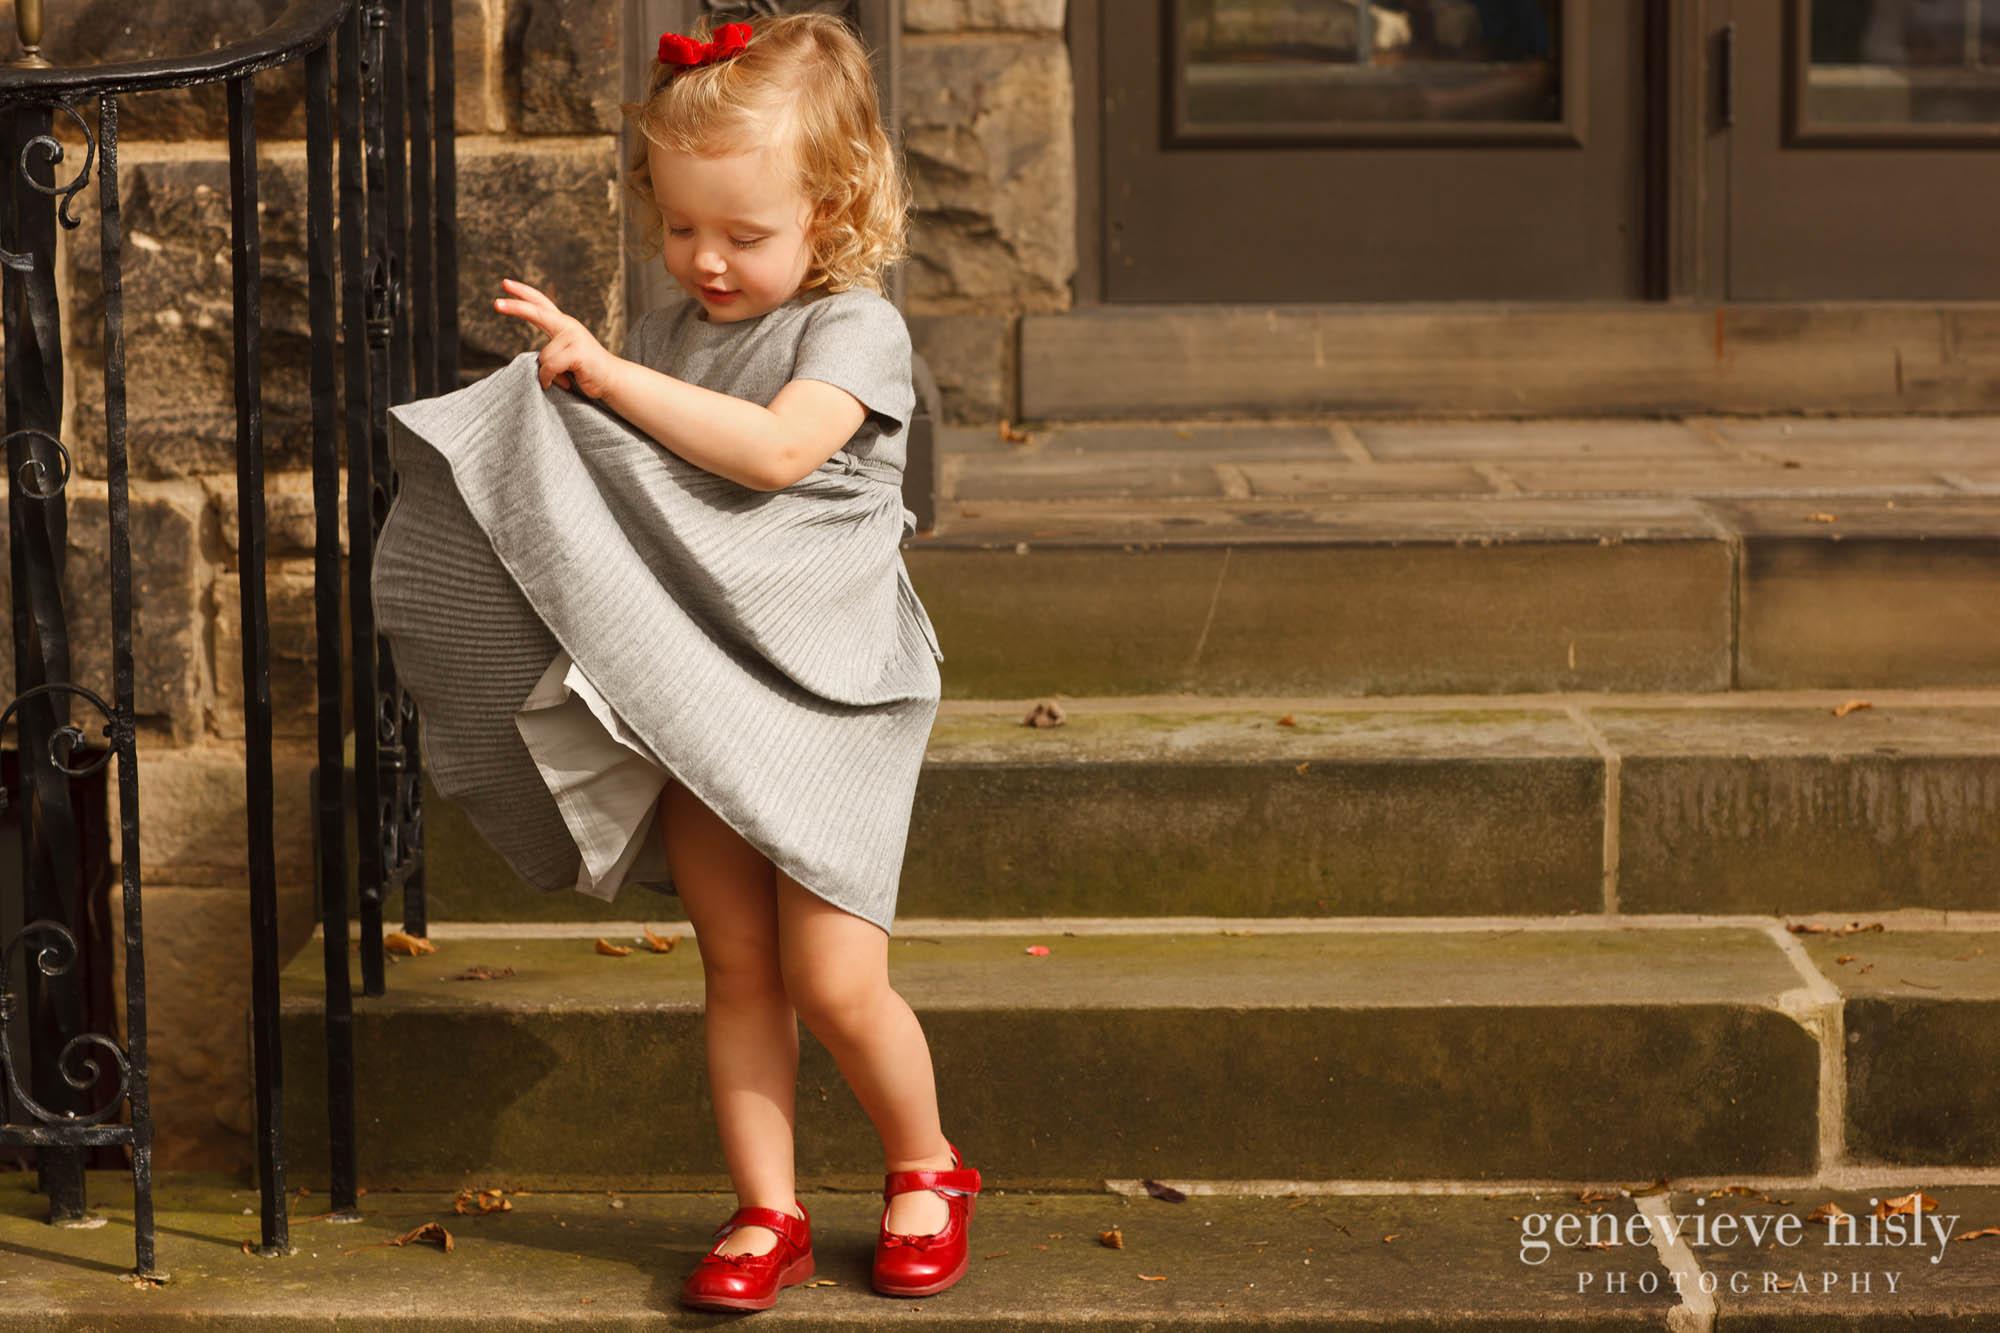 Copyright Genevieve Nisly Photography, Fall, Family, Portraits